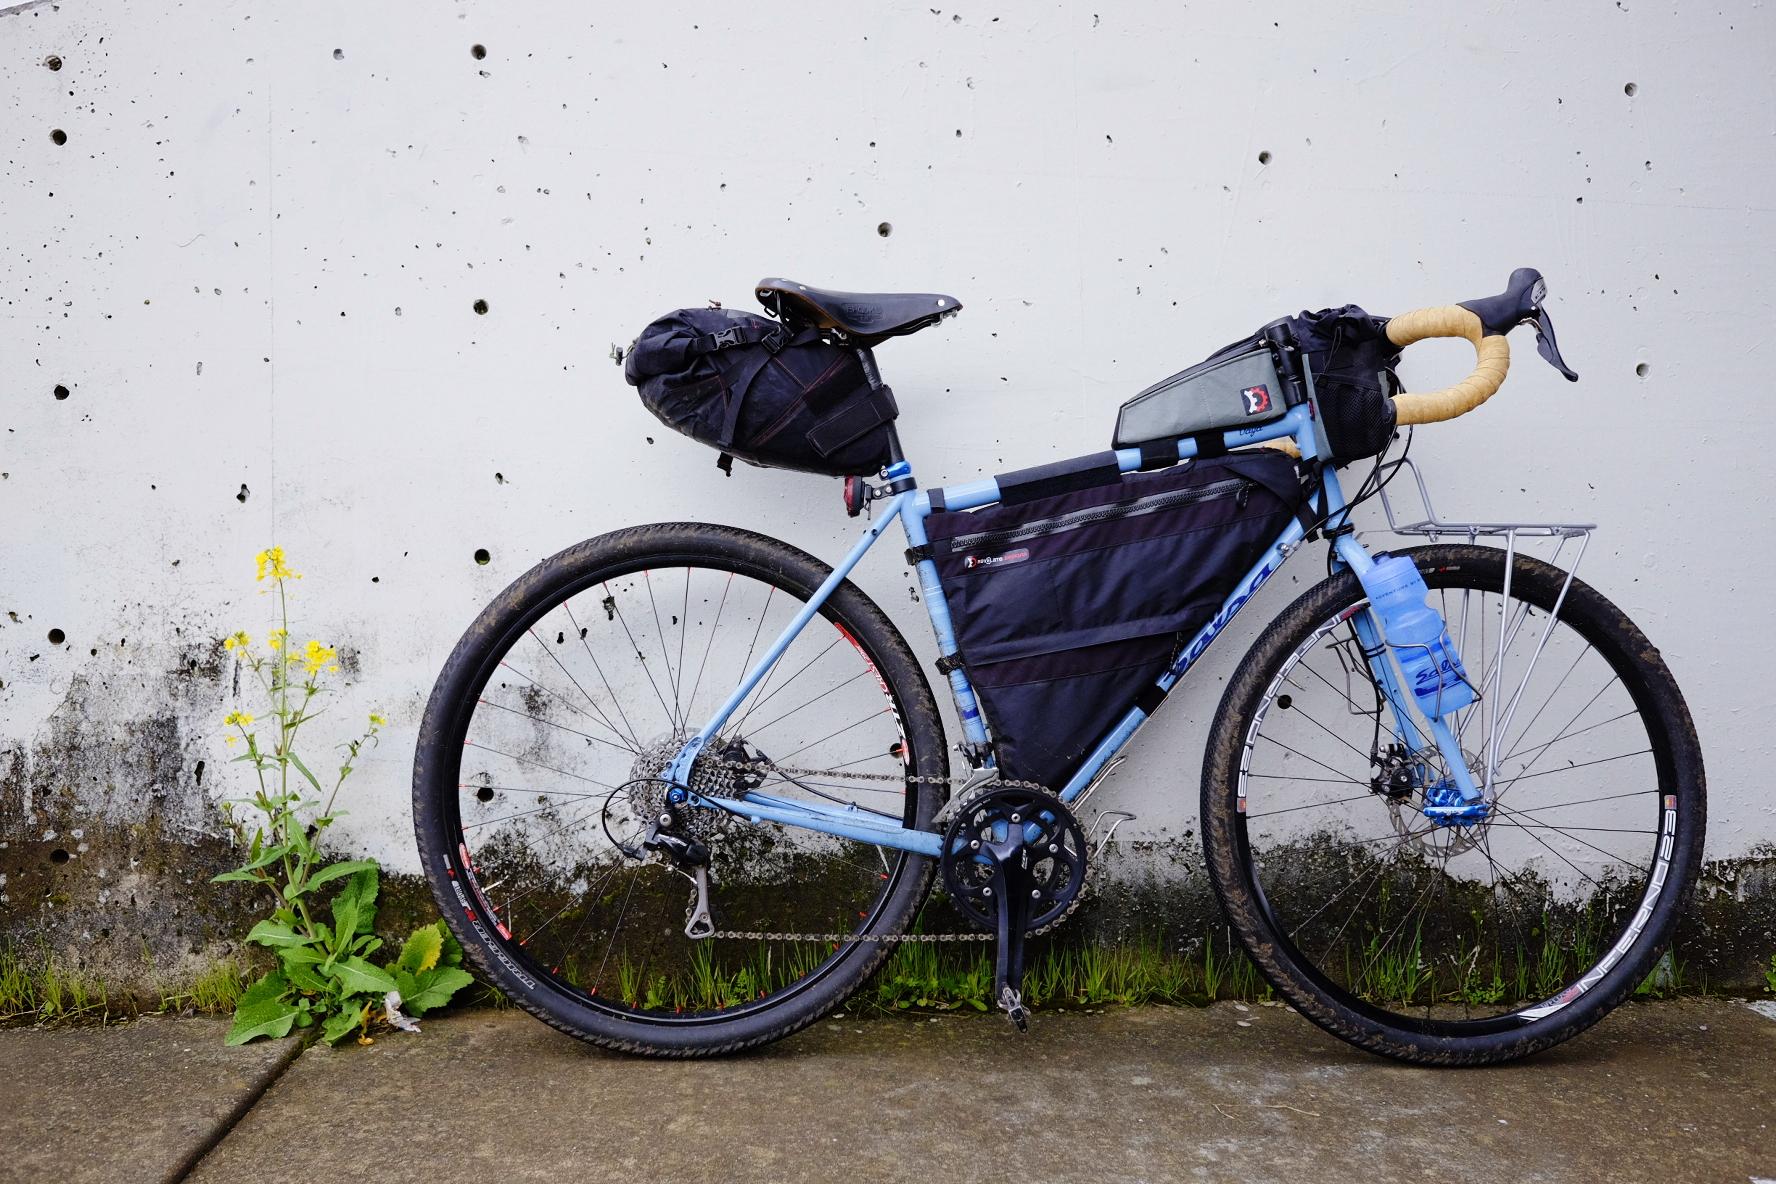 76. Bike portrait